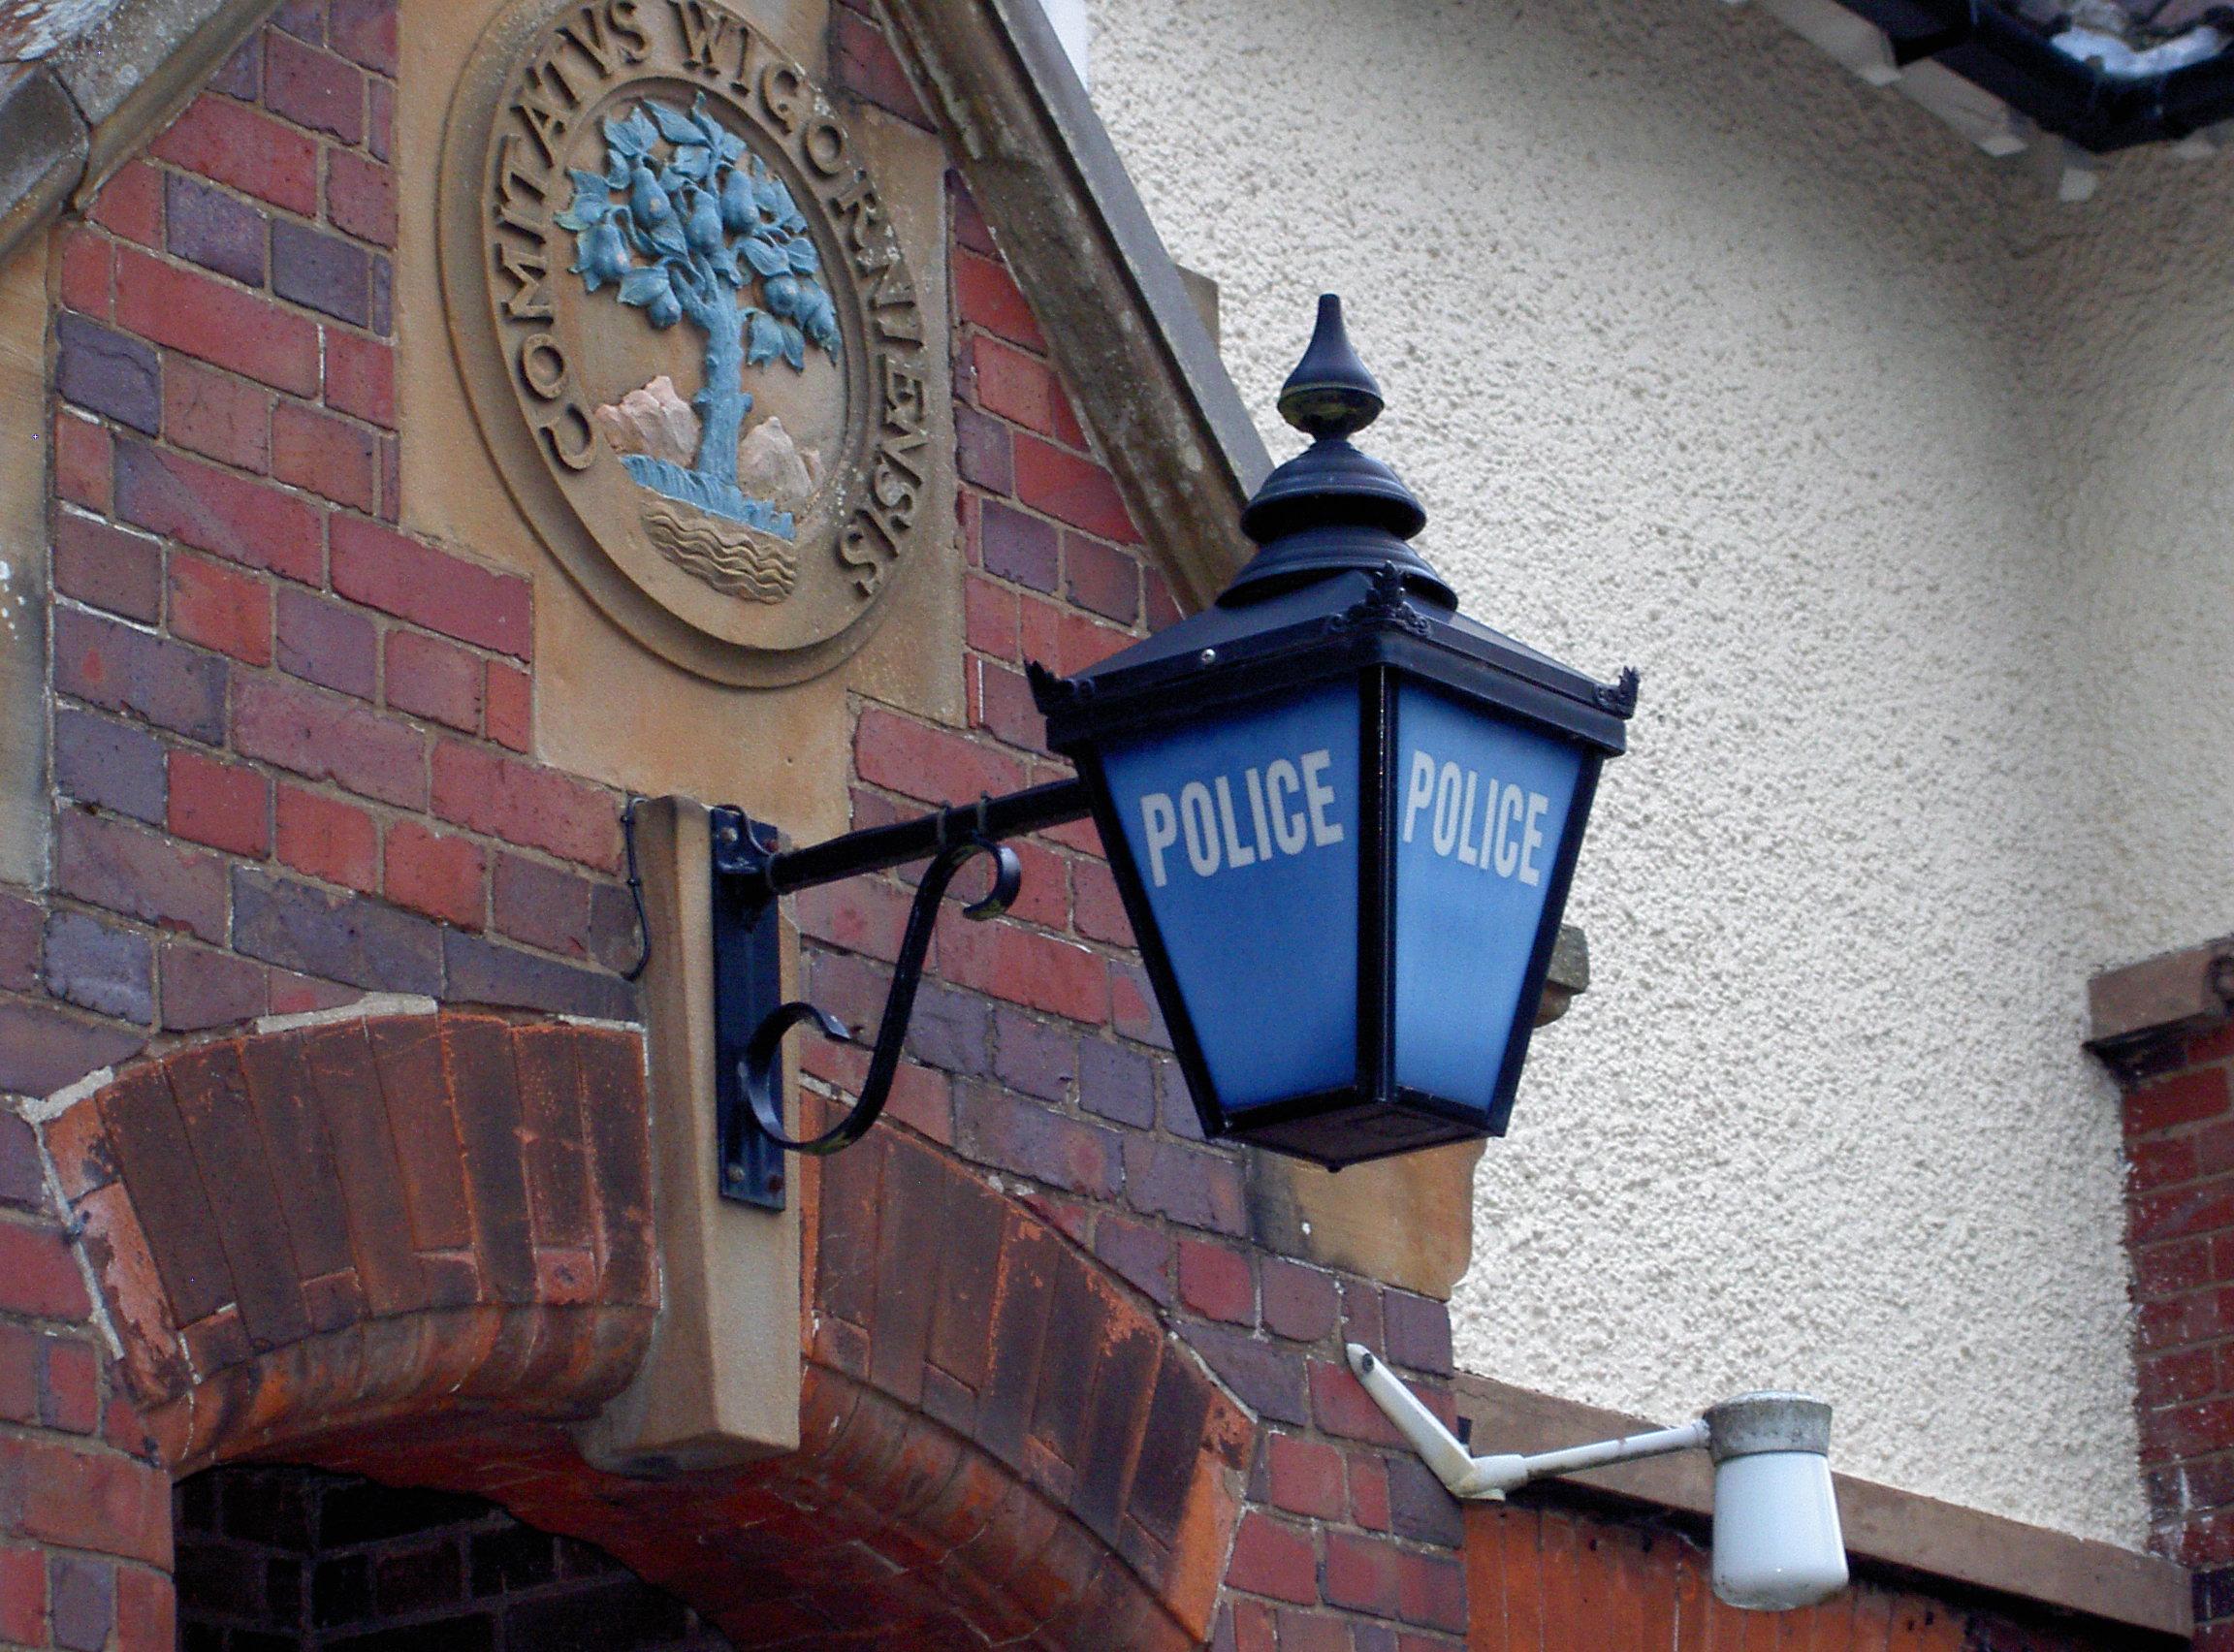 Mercia heritage police lantern